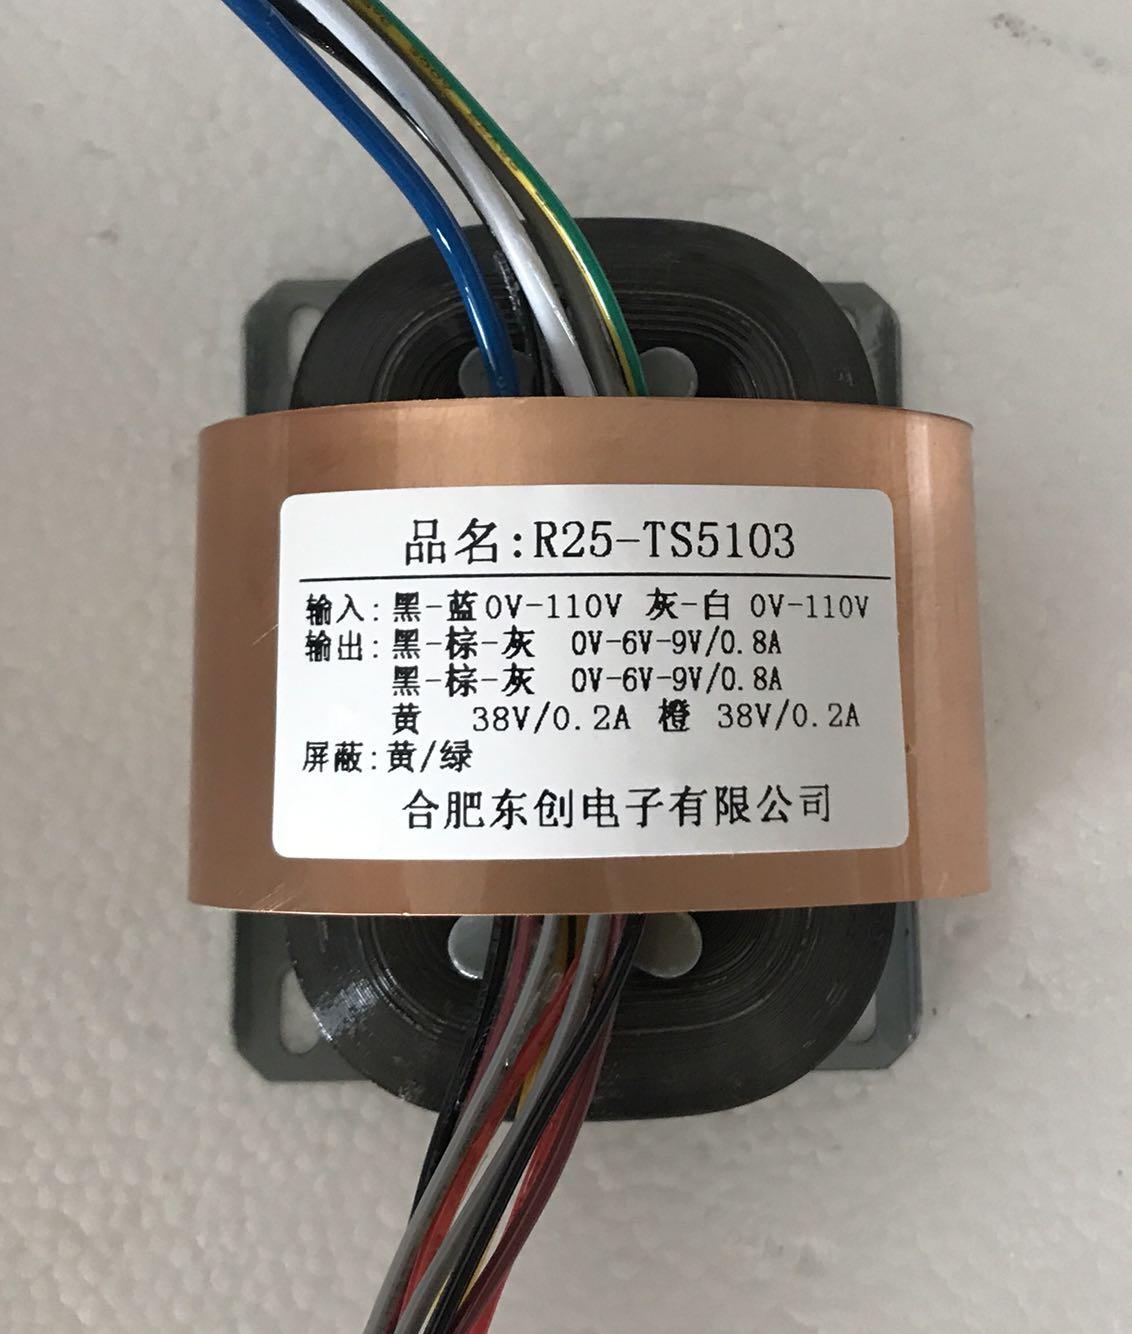 2X0V-6V-9V 0.8A 38V-0V-38V 0.2A R Core Transformer 30VA R25 custom transformer 110V/110V with copper shield for Power amplifier2X0V-6V-9V 0.8A 38V-0V-38V 0.2A R Core Transformer 30VA R25 custom transformer 110V/110V with copper shield for Power amplifier